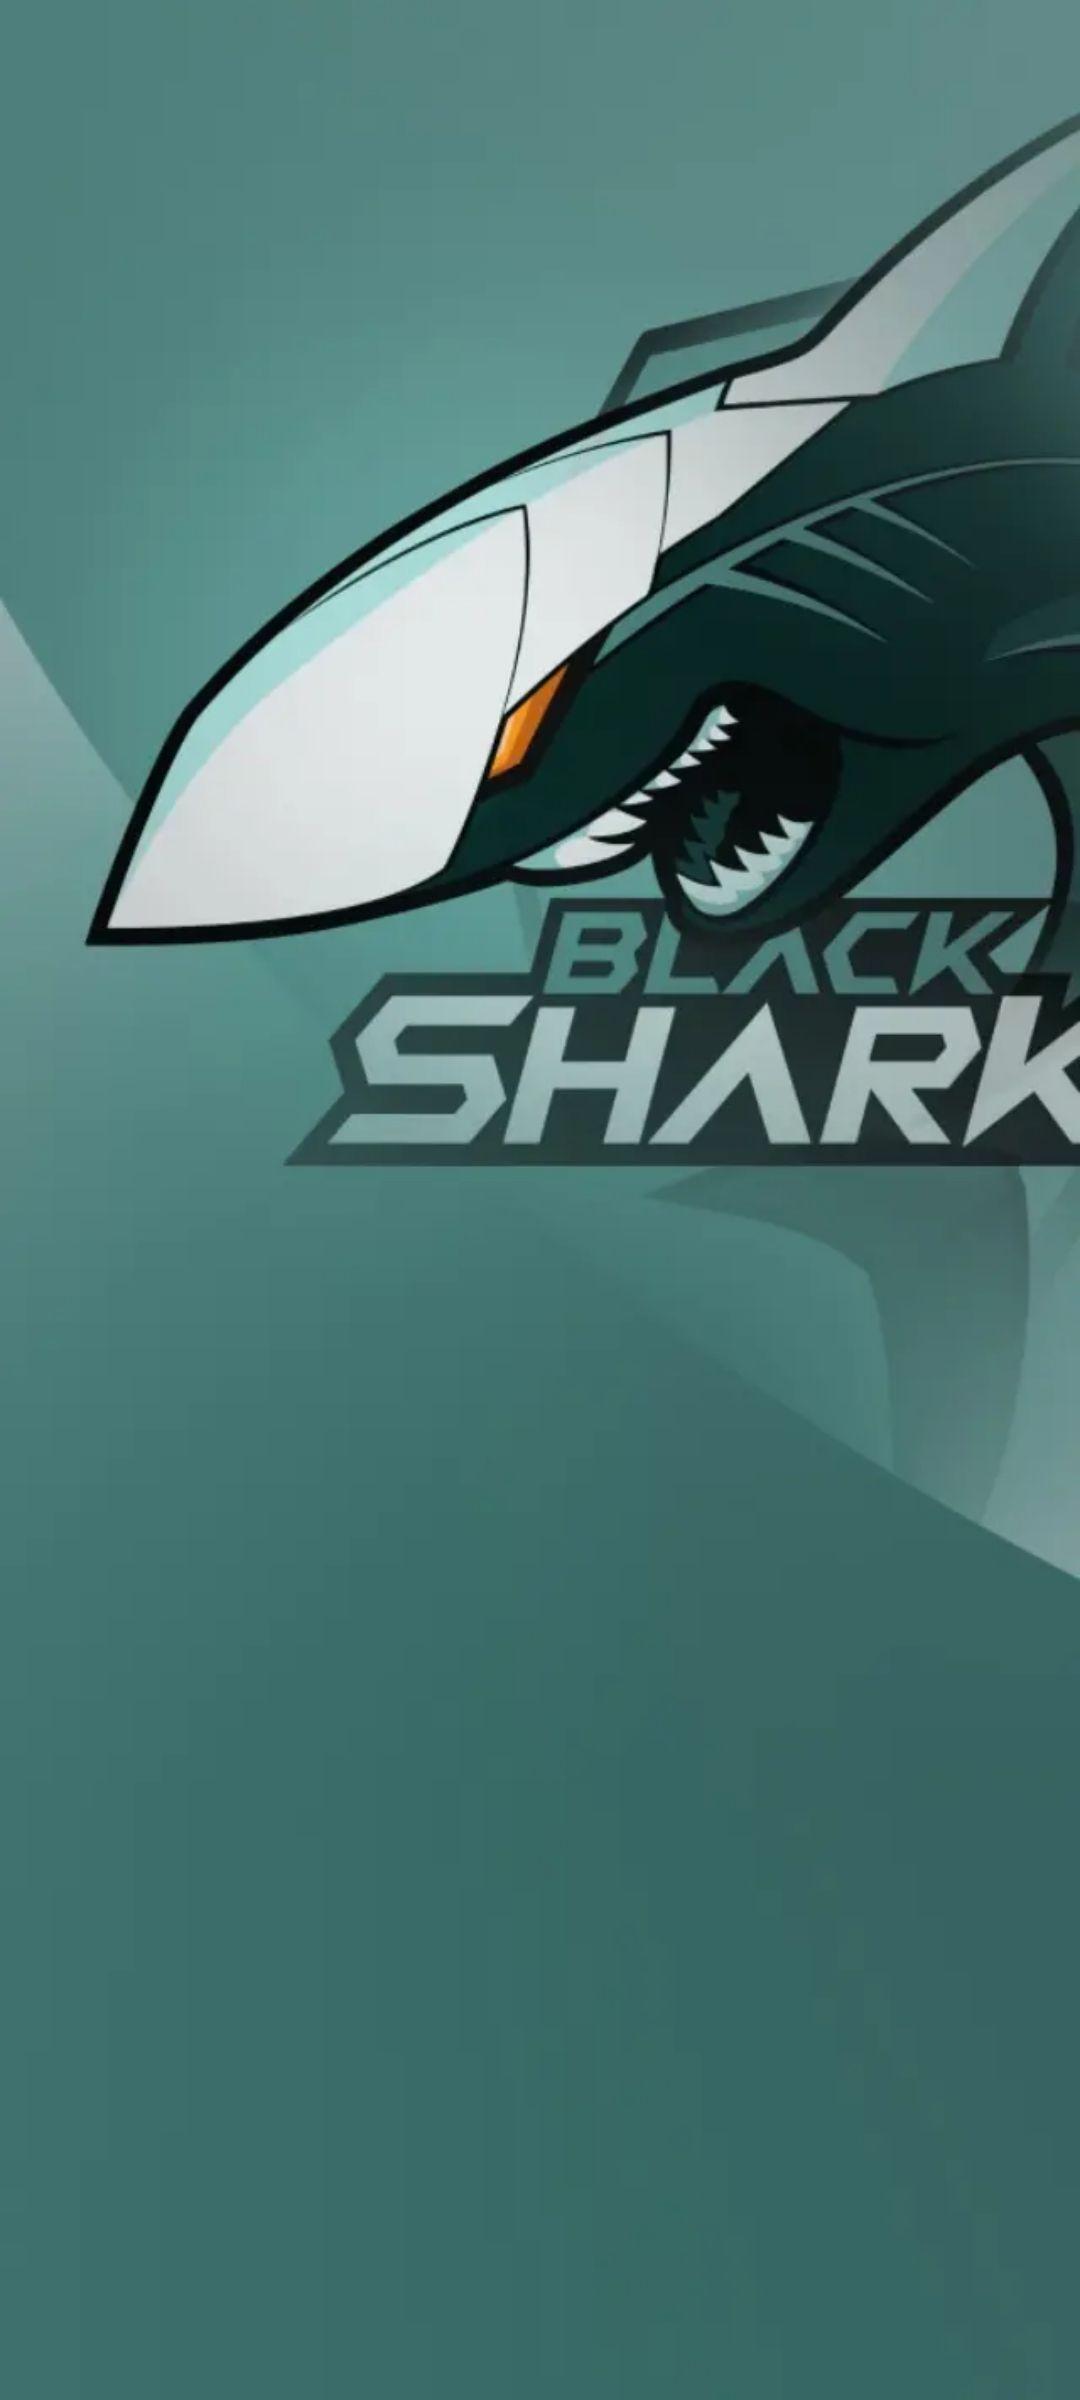 Black Shark 3 Pro Wallpaper Ytechb Exclusive Stock Wallpaper Xiaomi Wallpapers Wallpaper